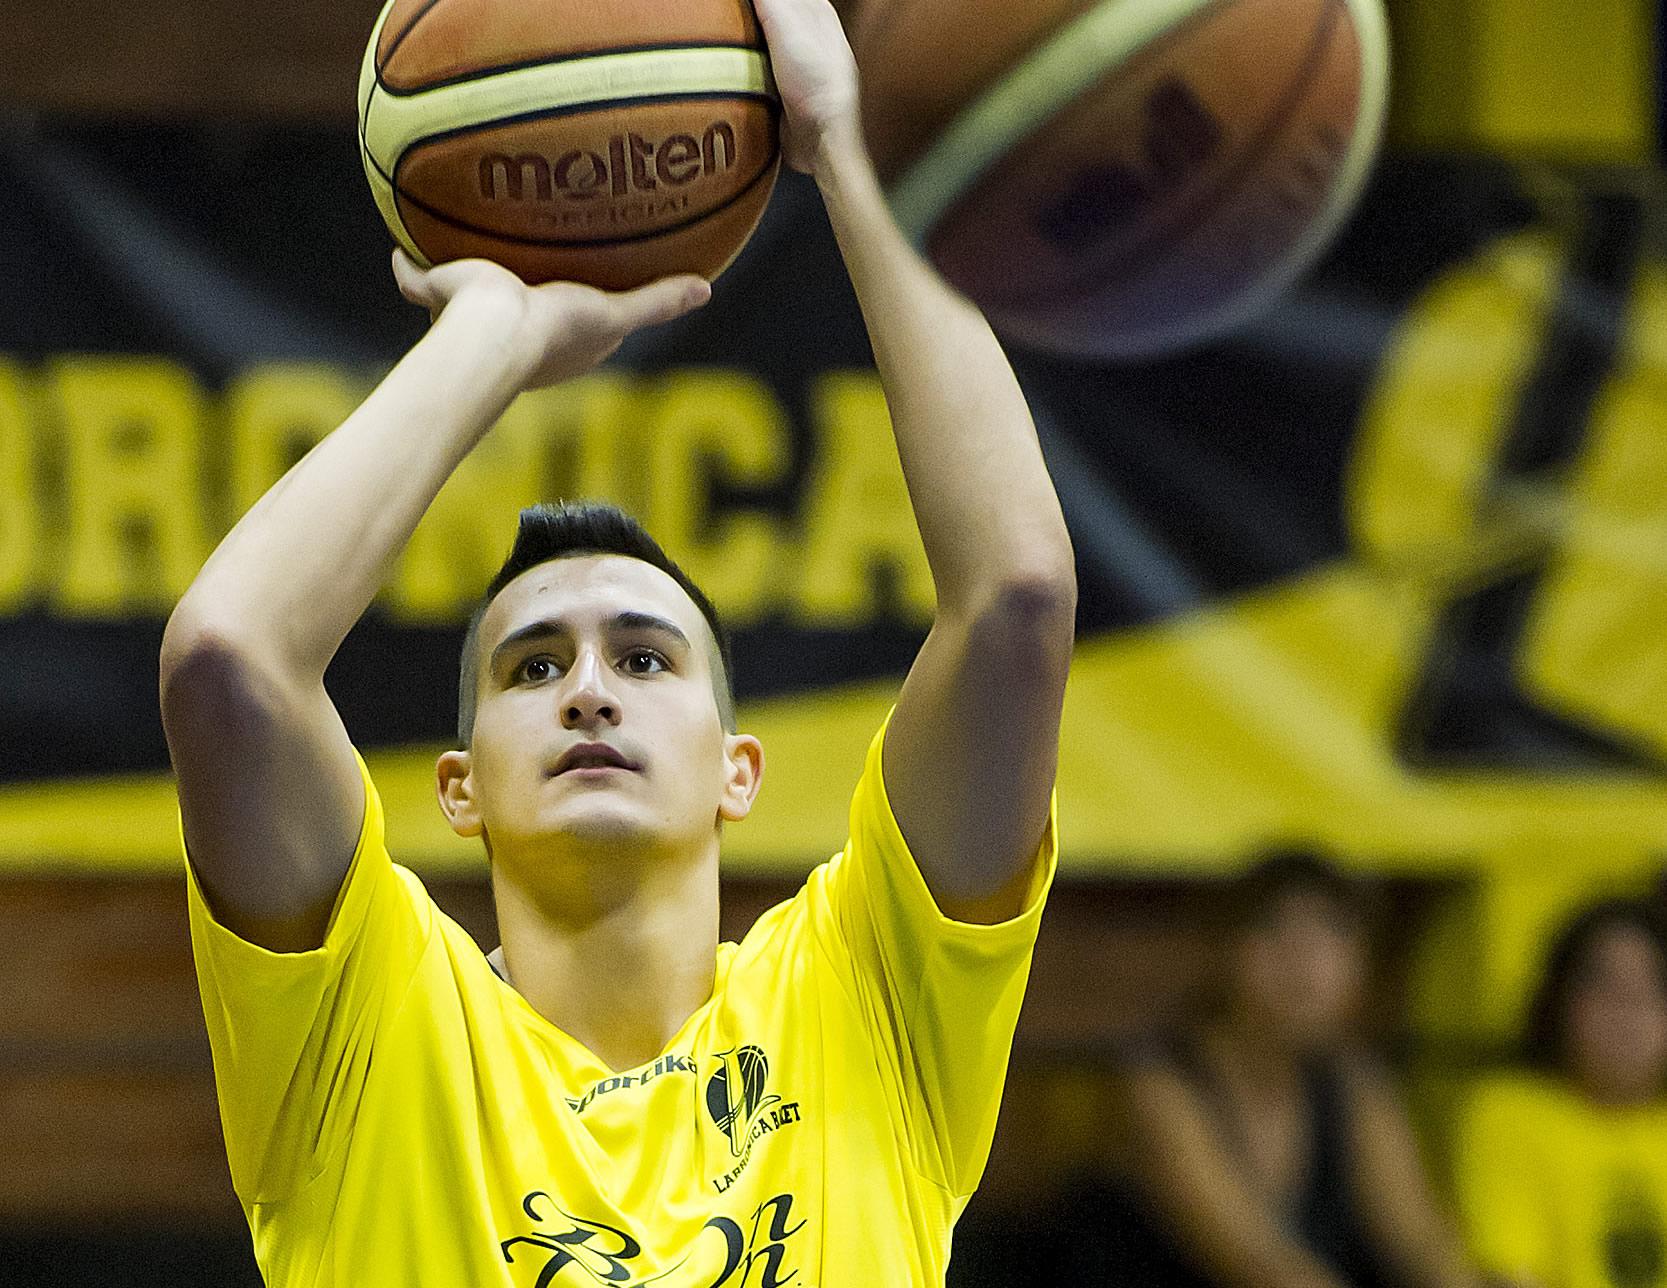 Labronica Basket - CliccaLivorno